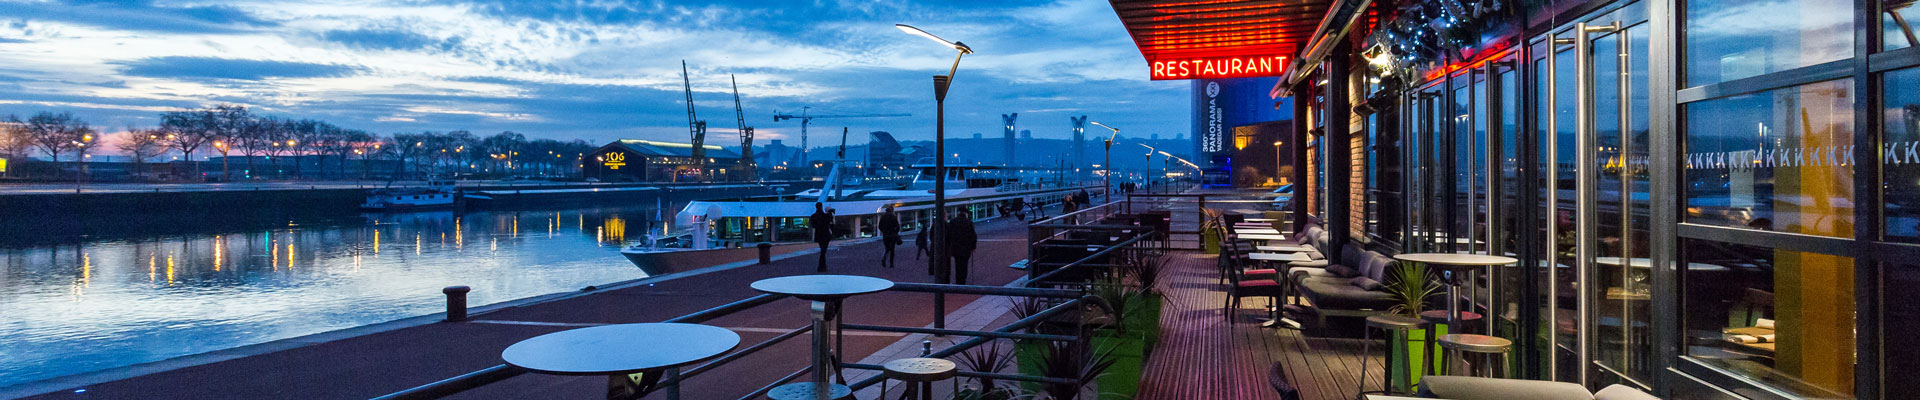 la-fabrik-steakhouse-food-&-drink-restaurant-bar-hangar-quai-rouen-seine-53-bandeau-terrasse-1920x400